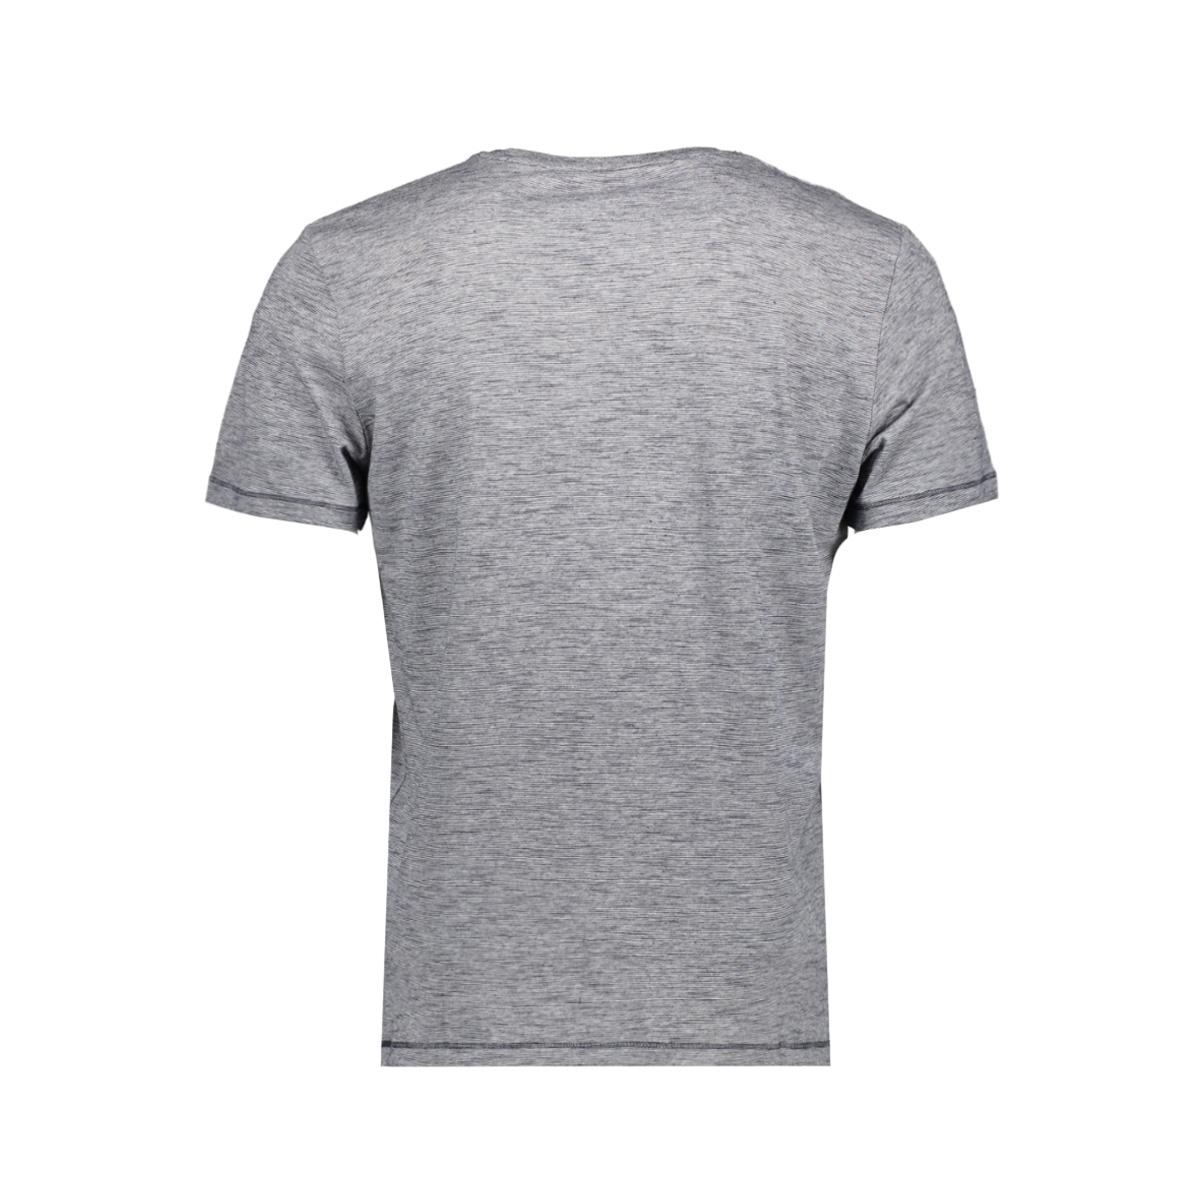 t shirt met print 1008640xx10 tom tailor t-shirt 19493